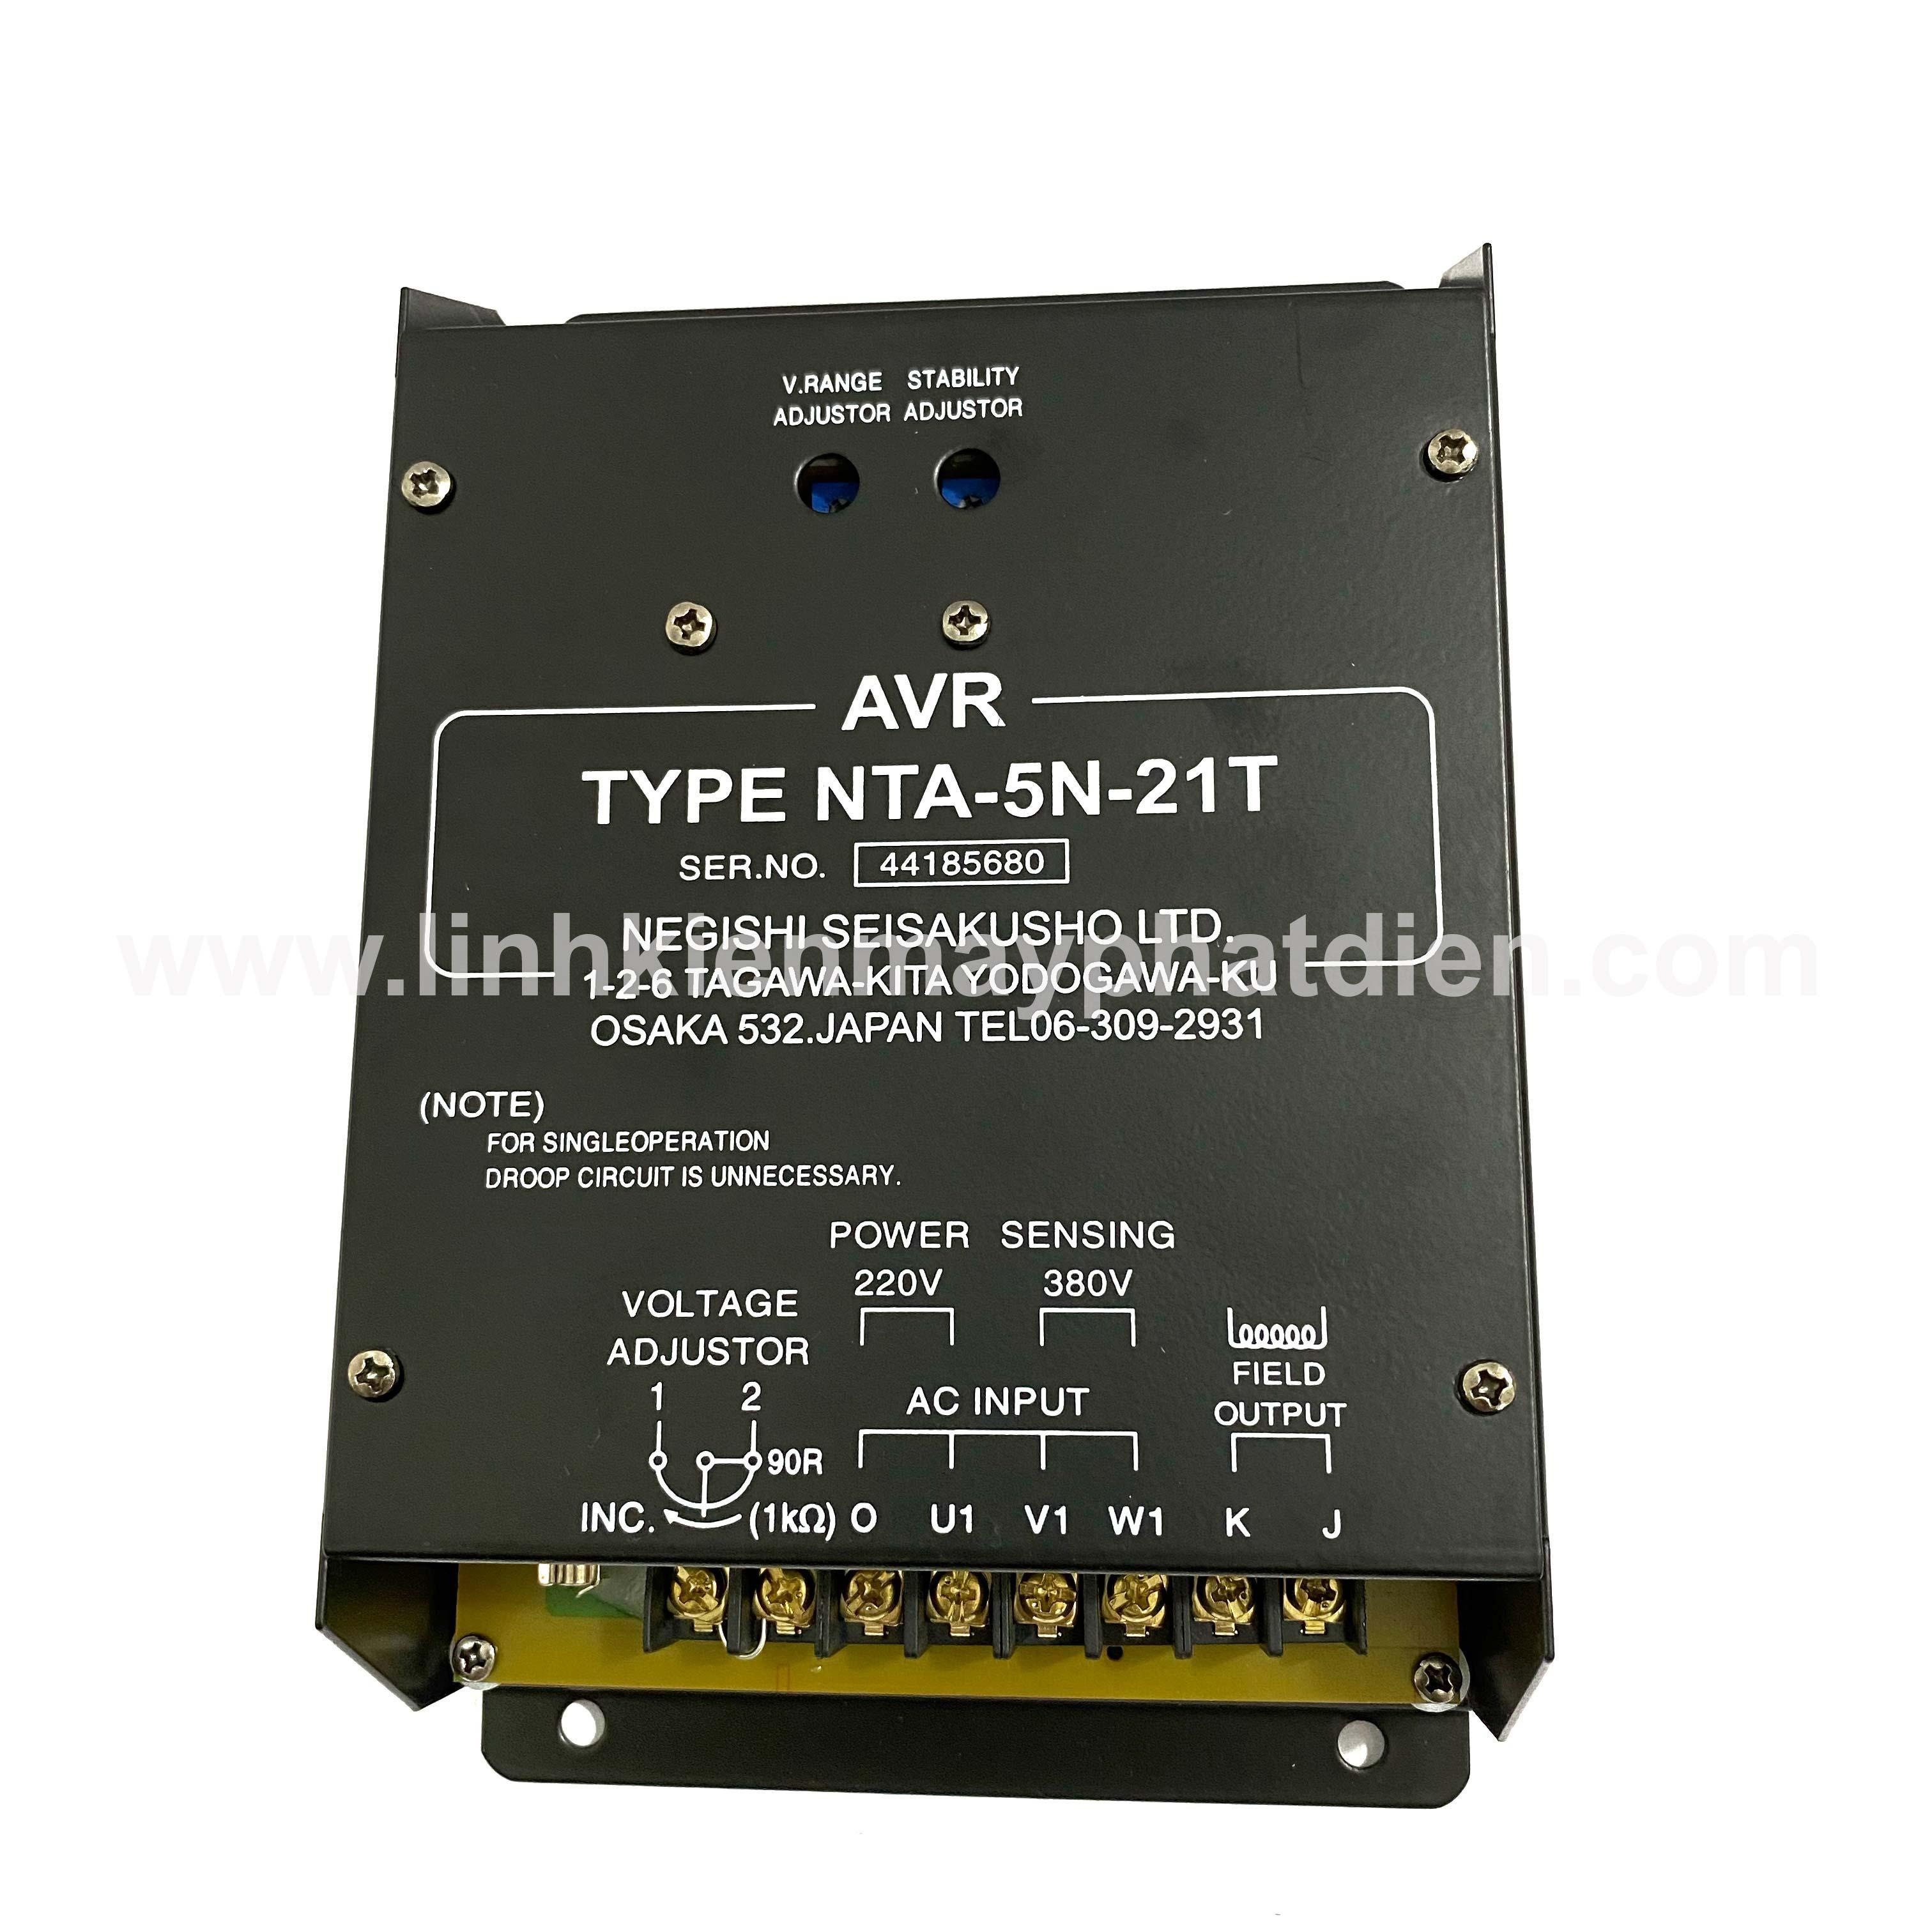 AVR Denyo NTA-50N-21T